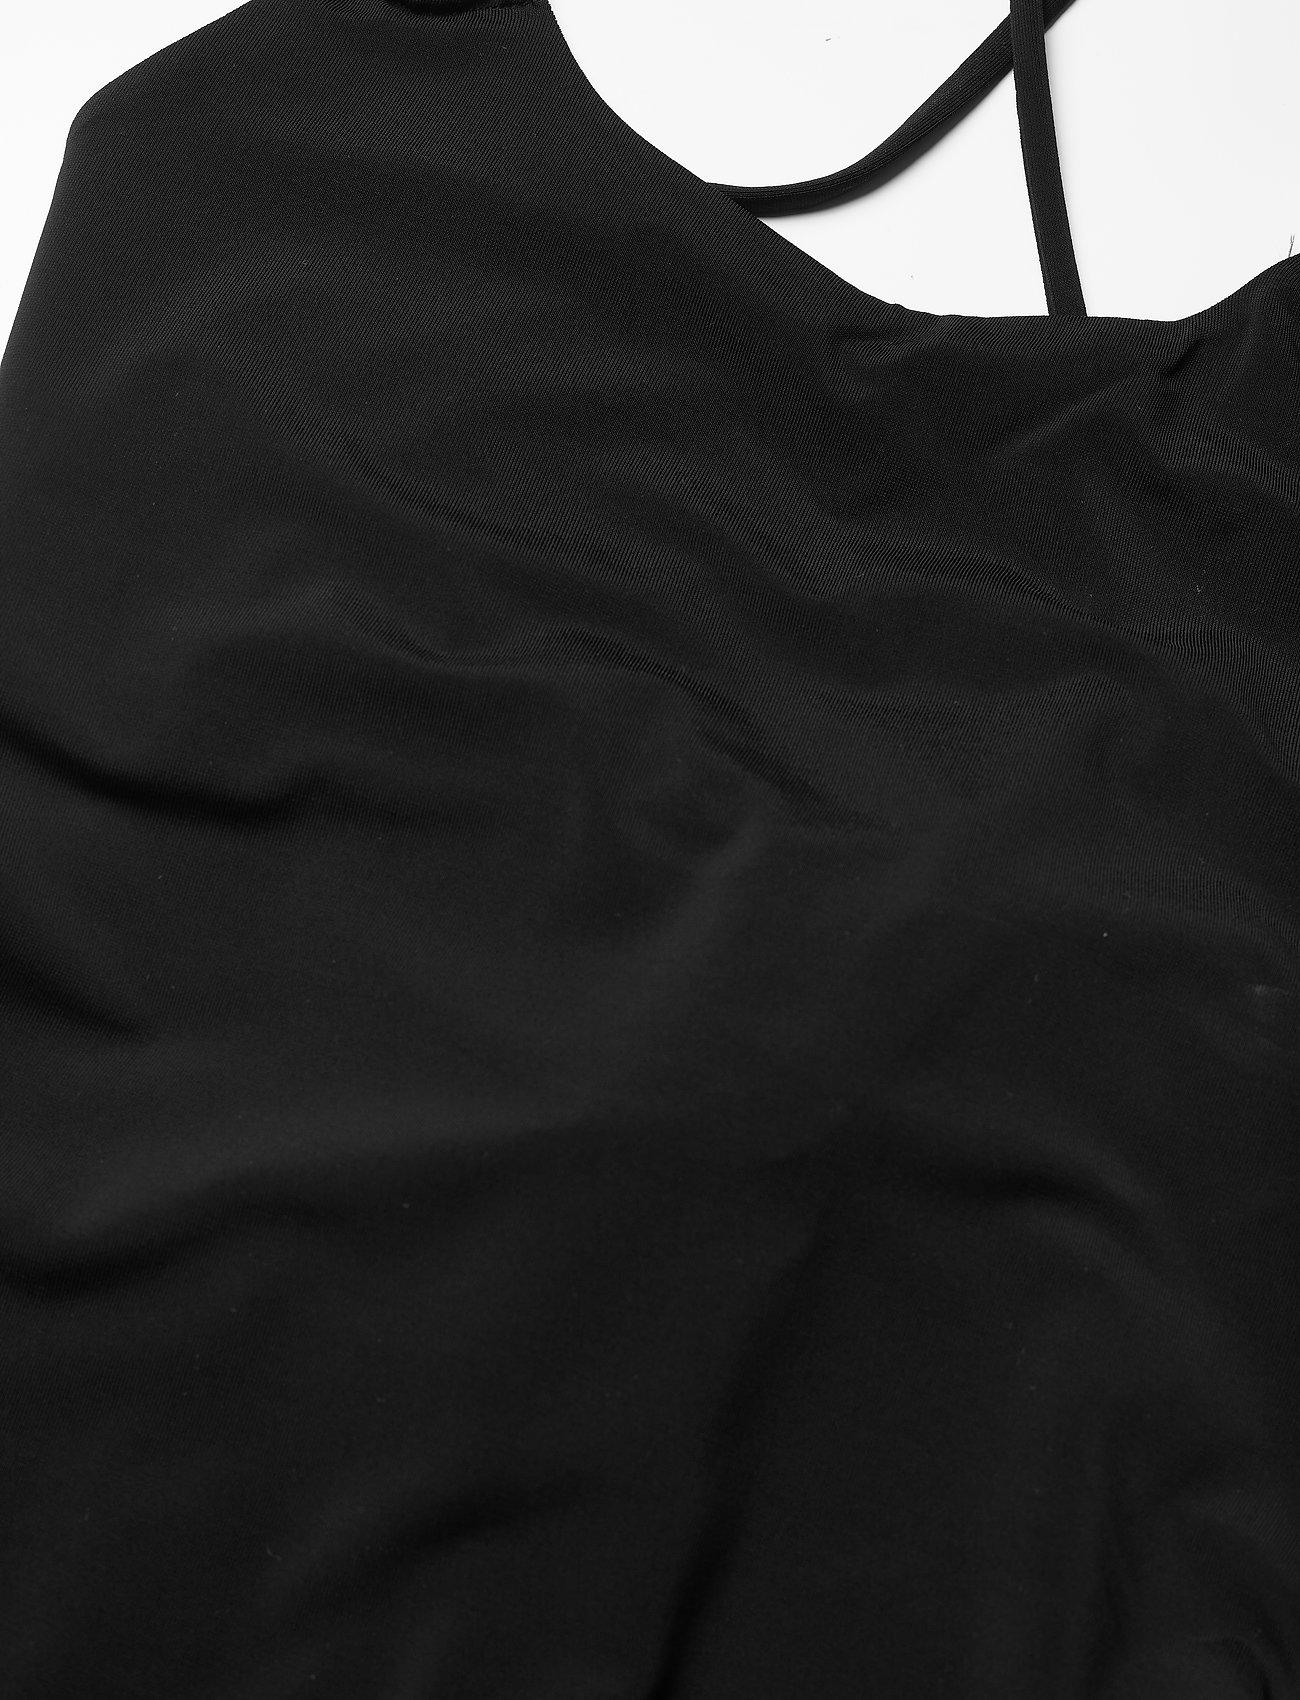 Max Mara Leisure - CREMONA - beachwear - black - 2